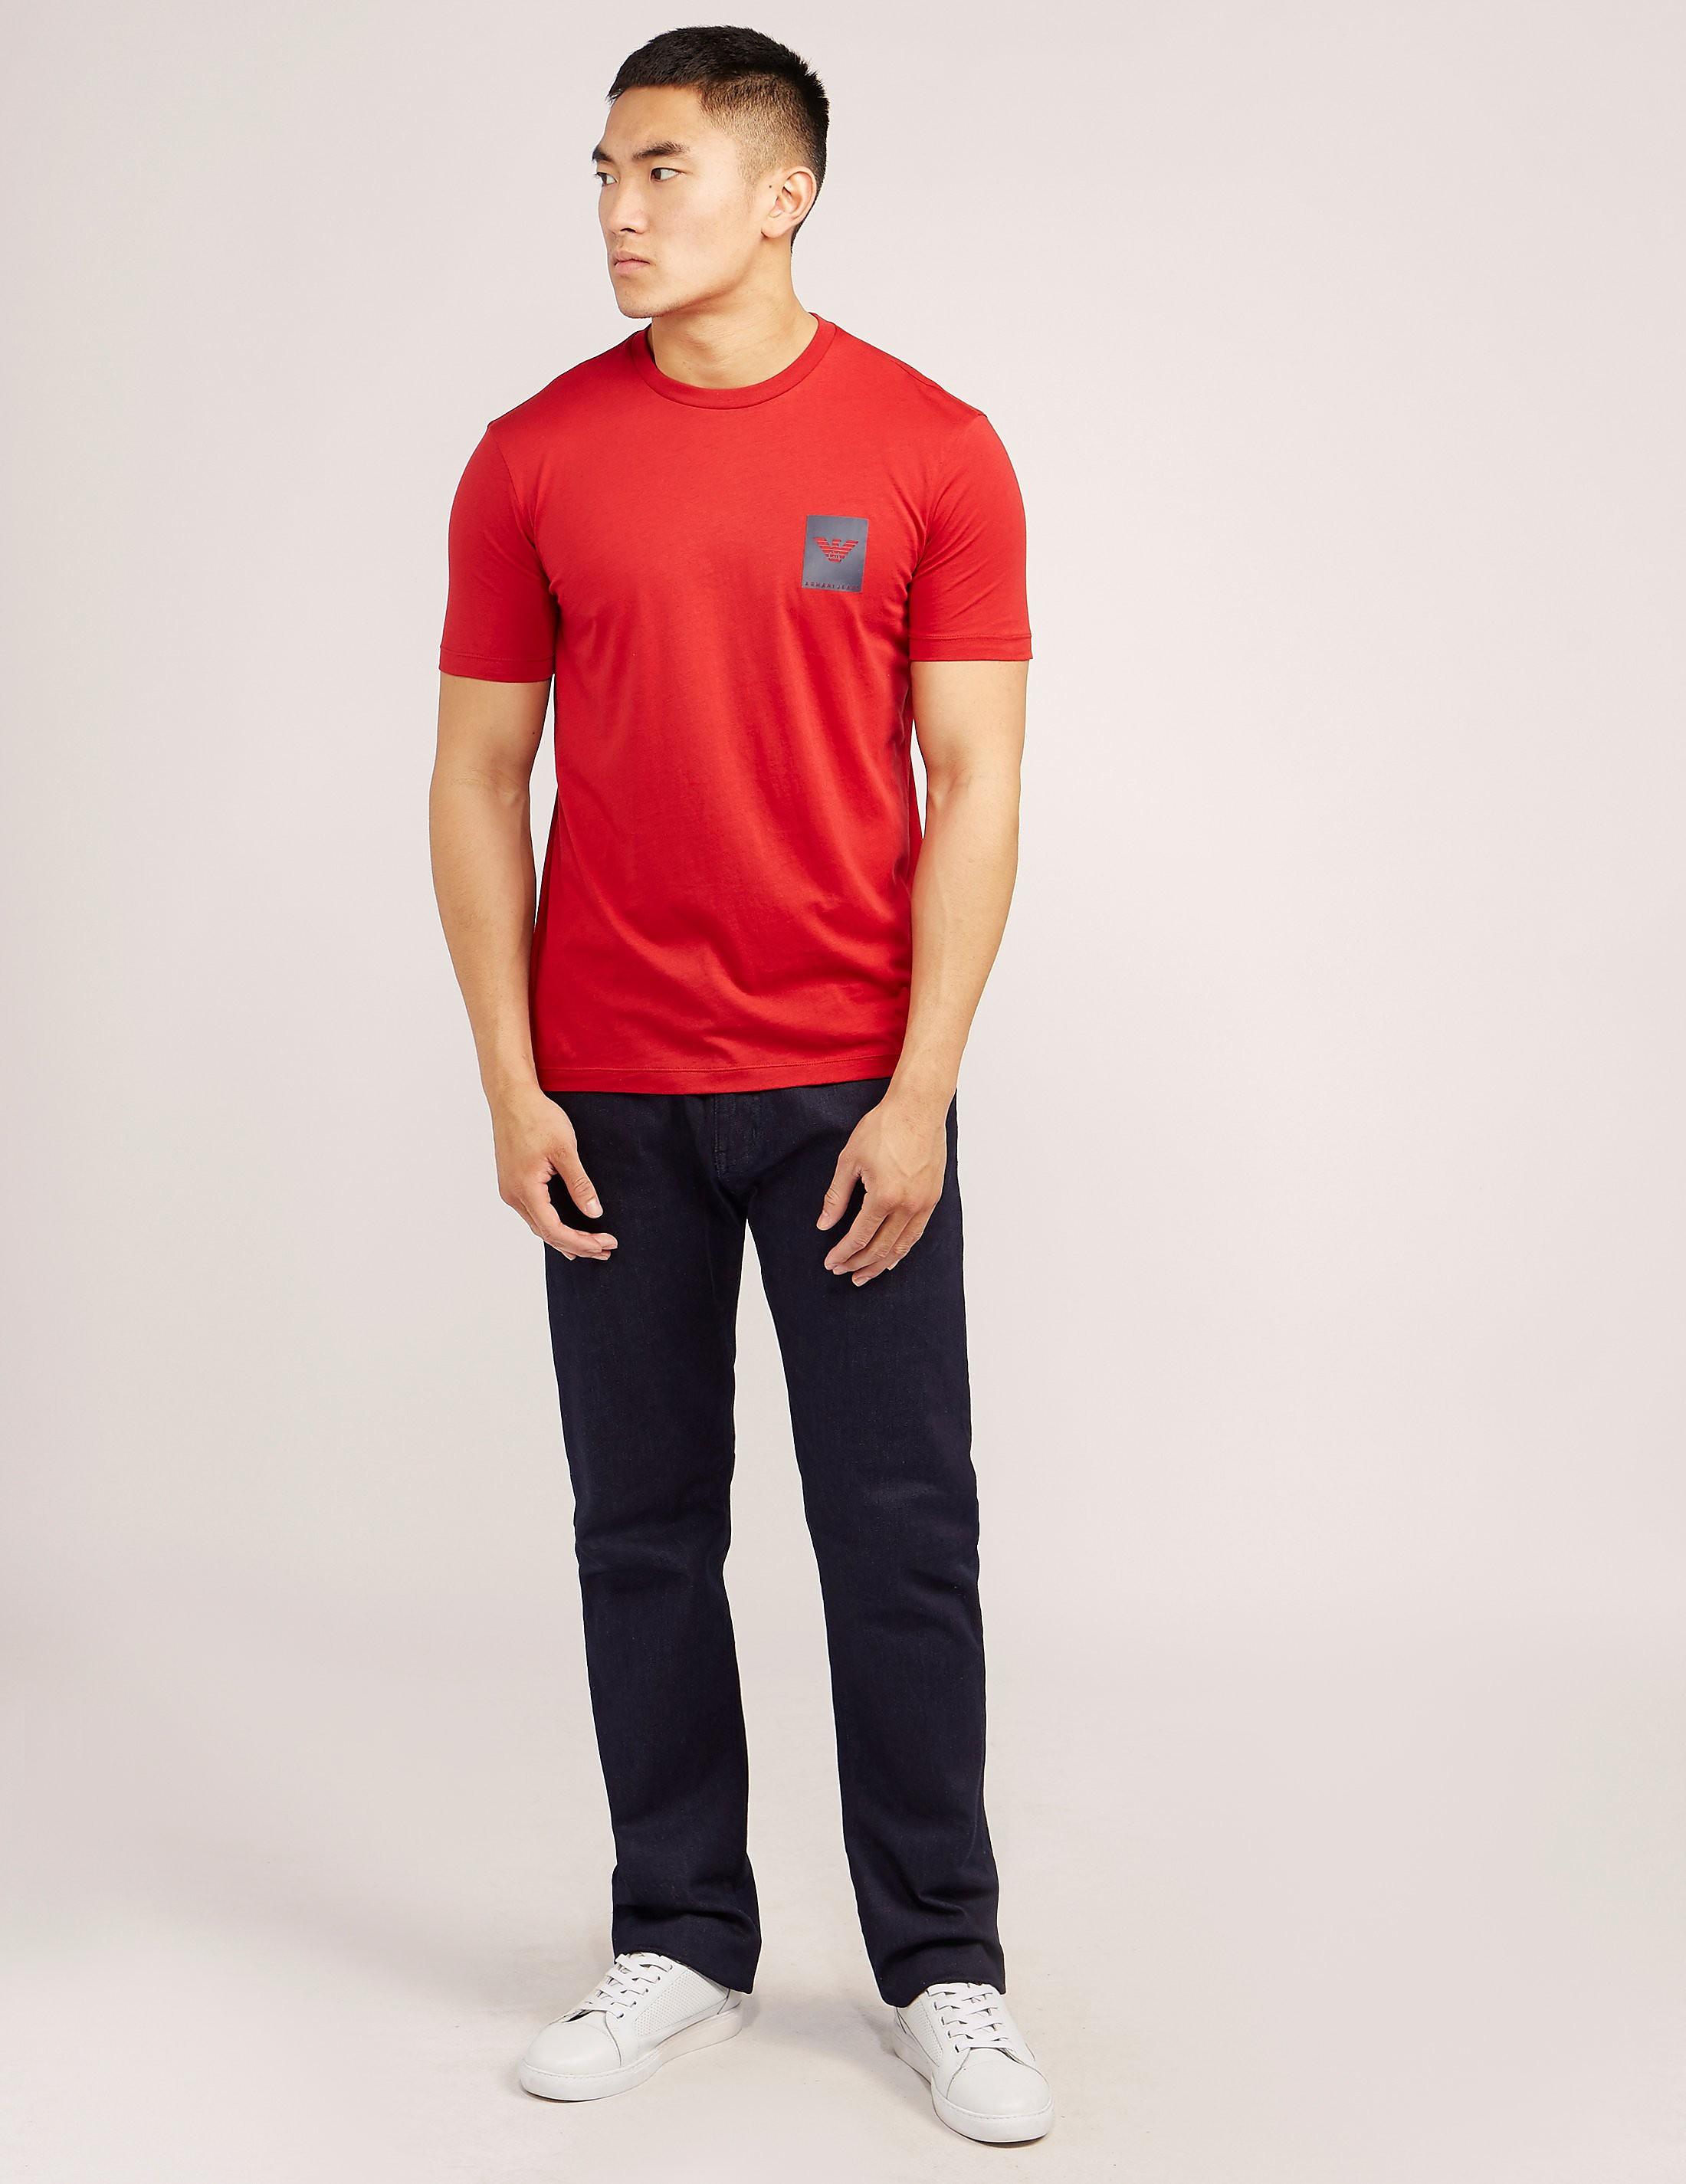 Armani Jeans Small Box Short Sleeve T-Shirt